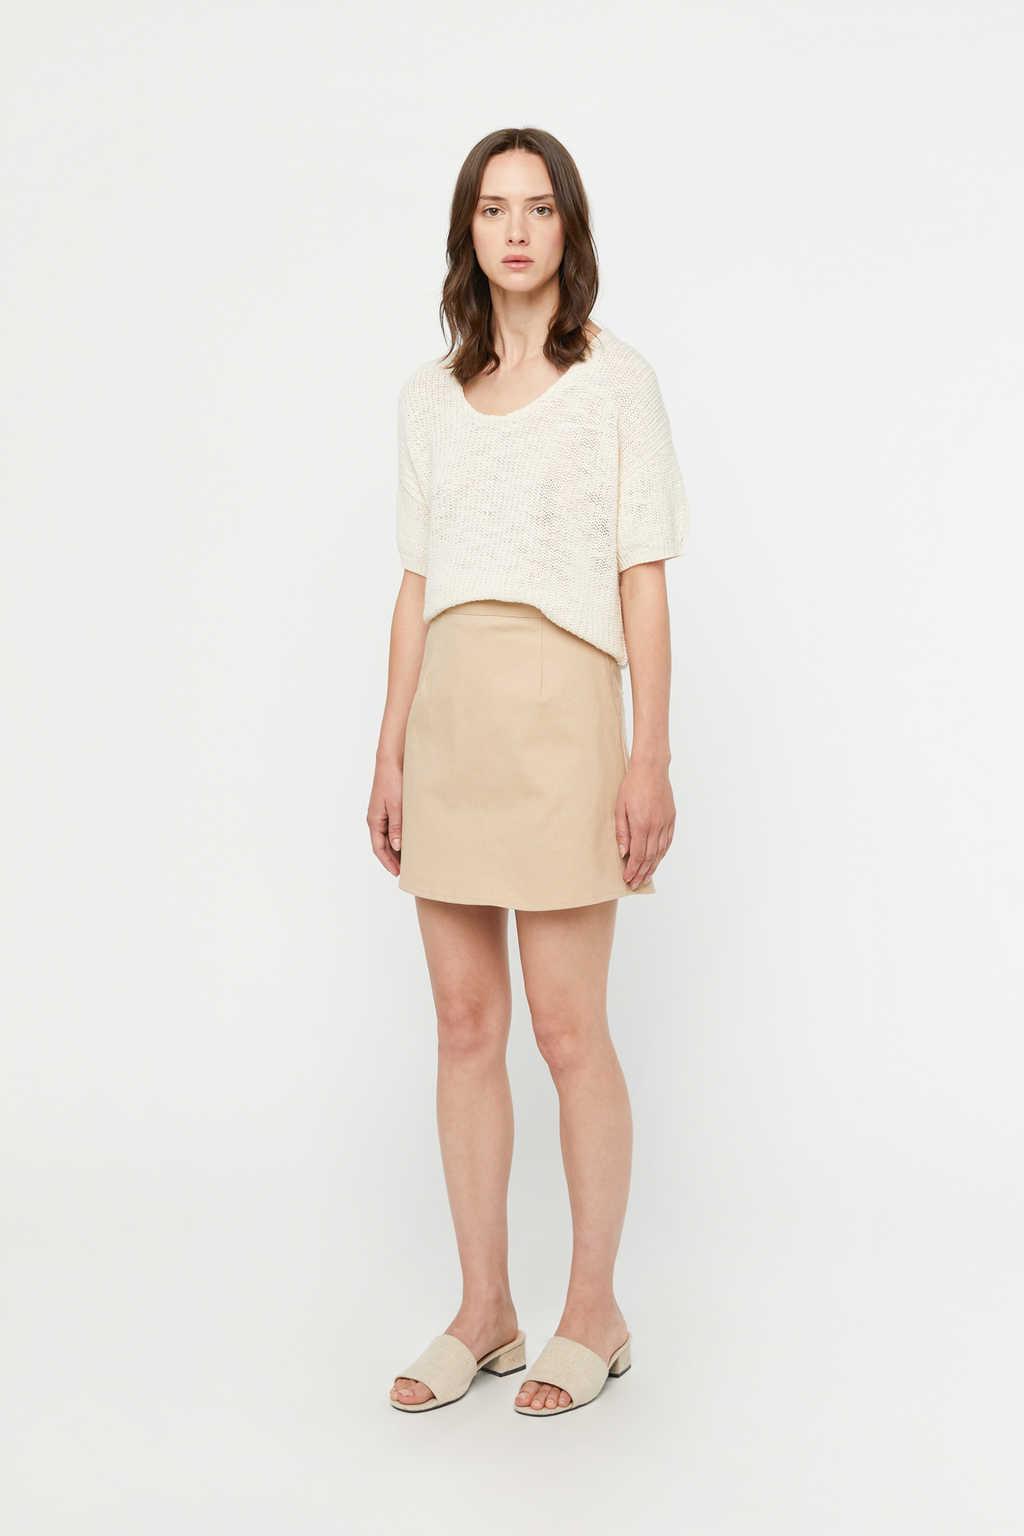 Sweater 3247 Cream 4